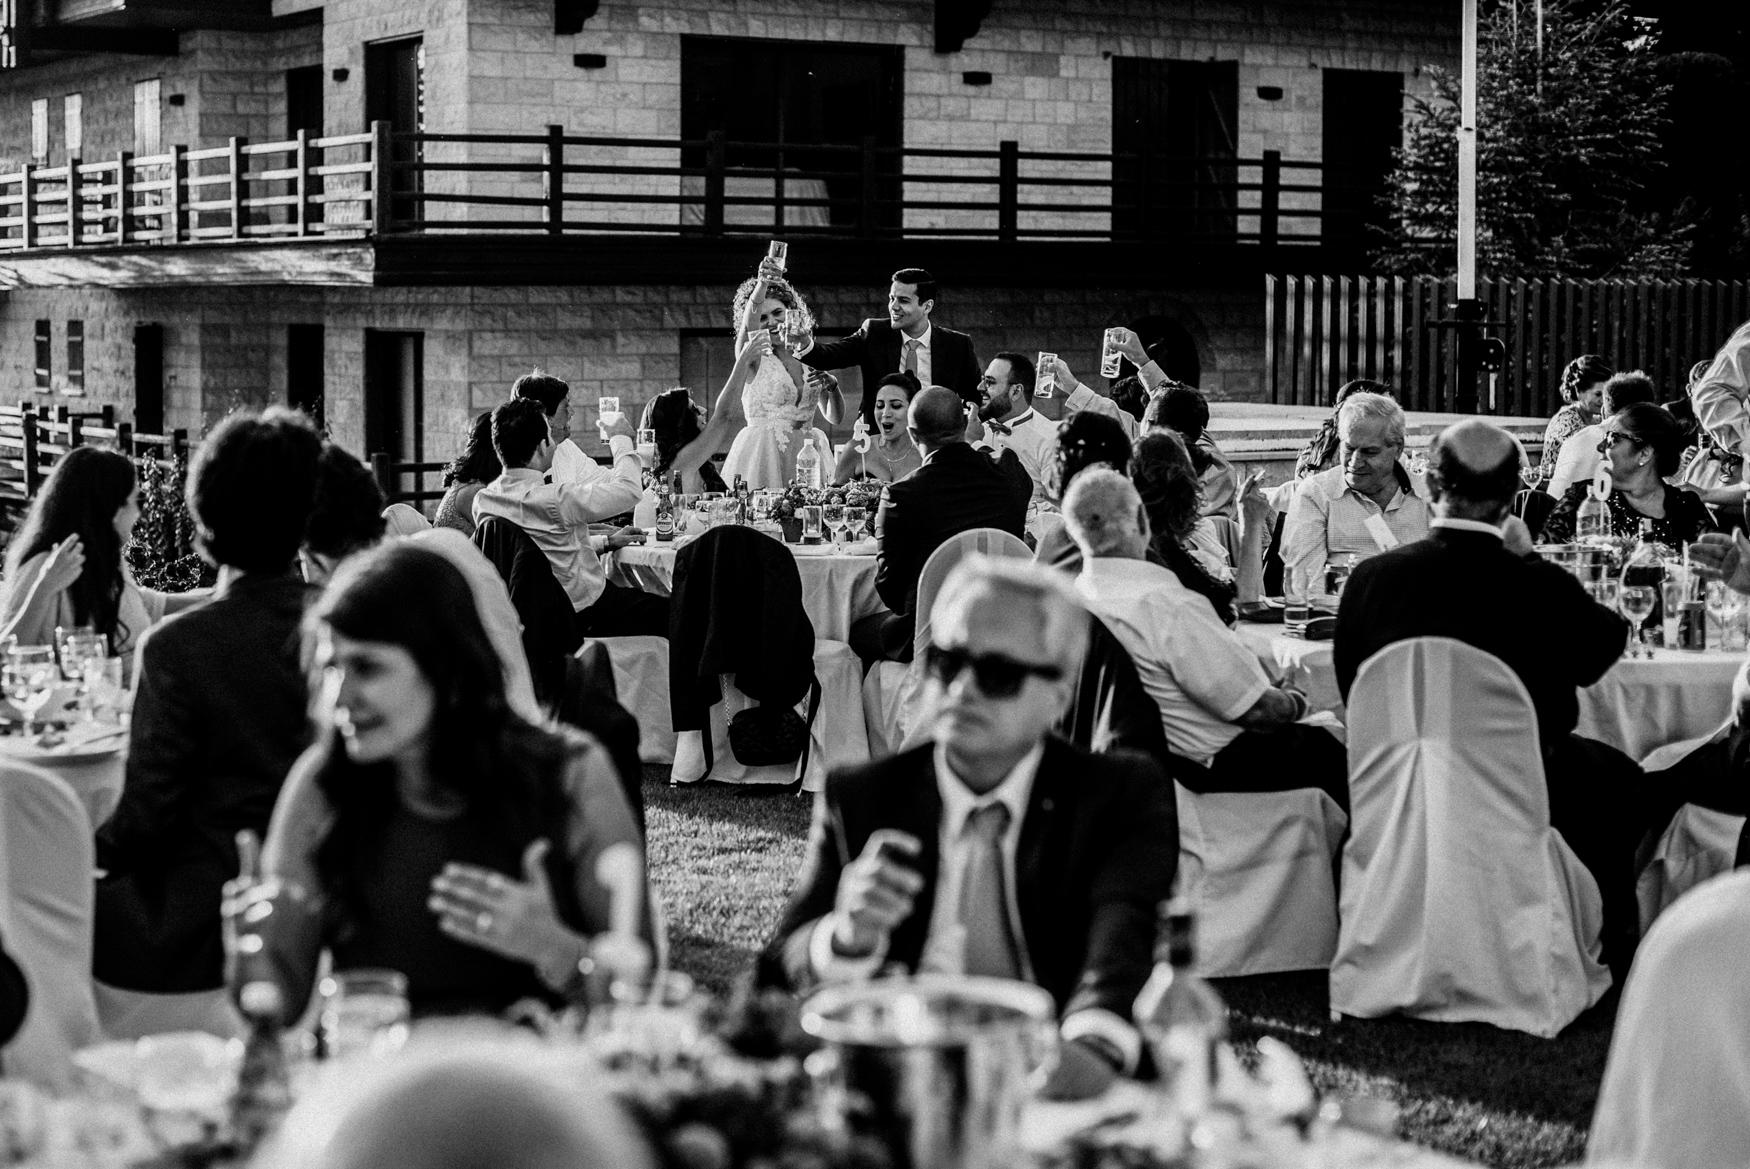 LR5 beirut lebanon mzaar intercontinental wedding photographer 011.jpg